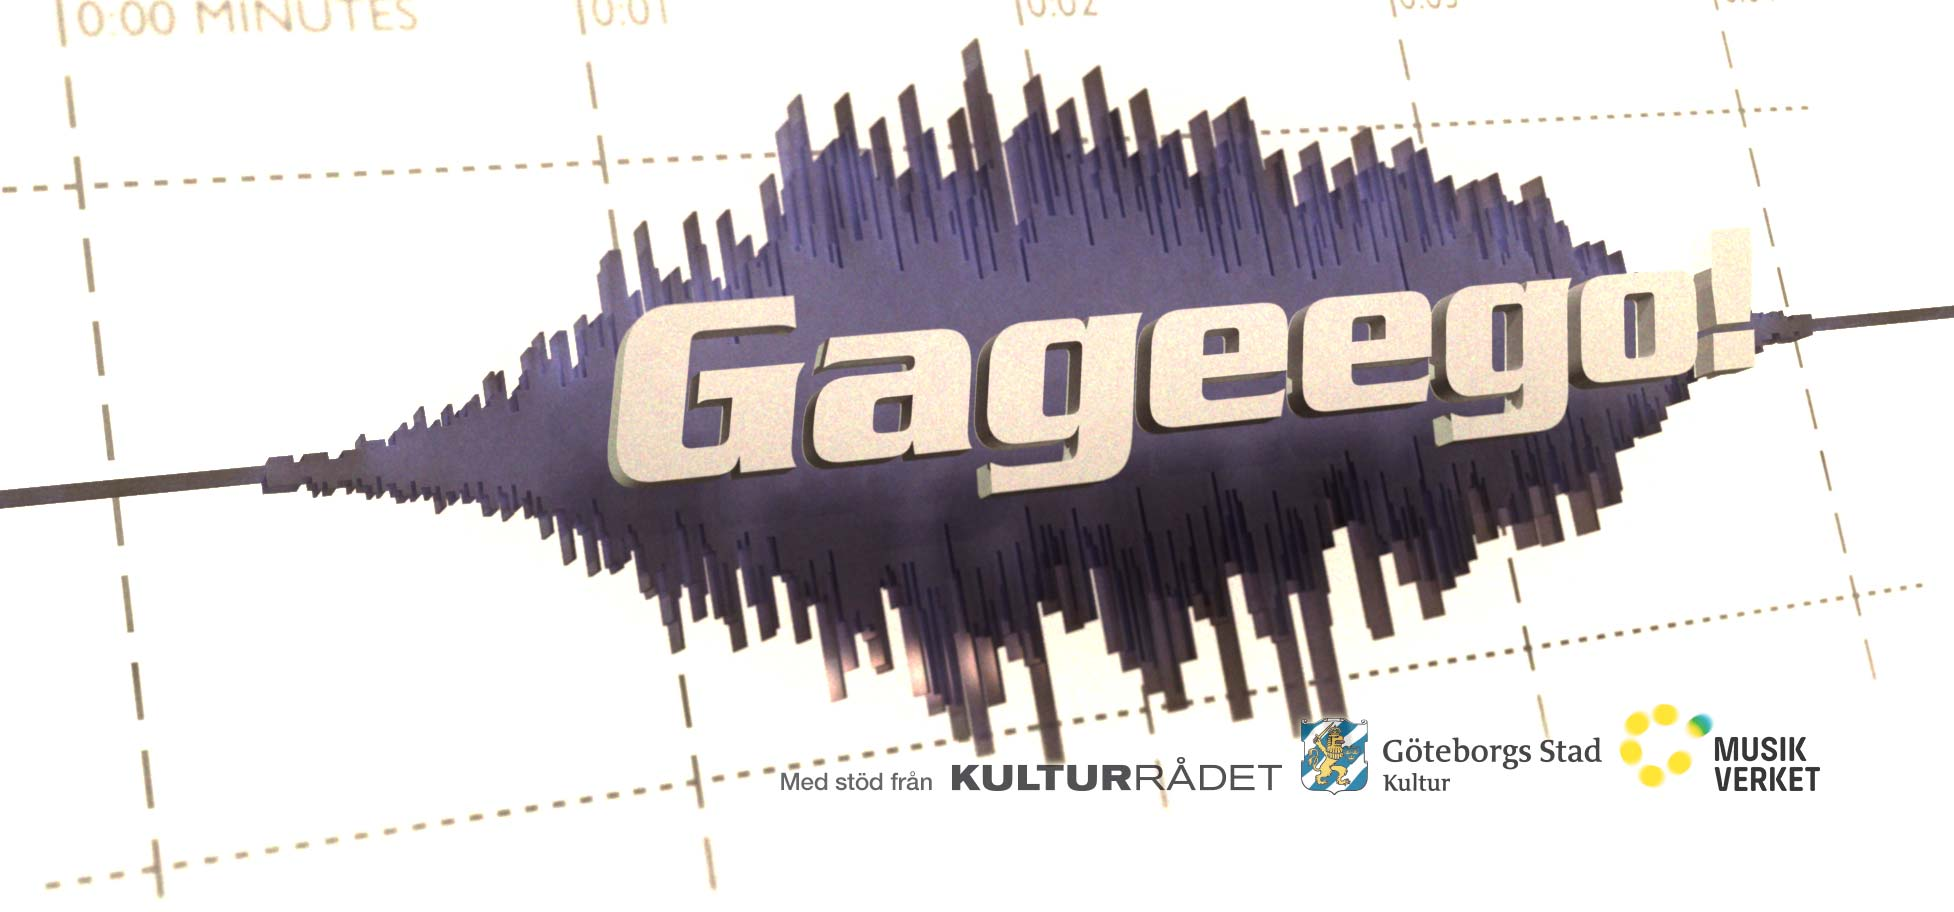 Gageego!